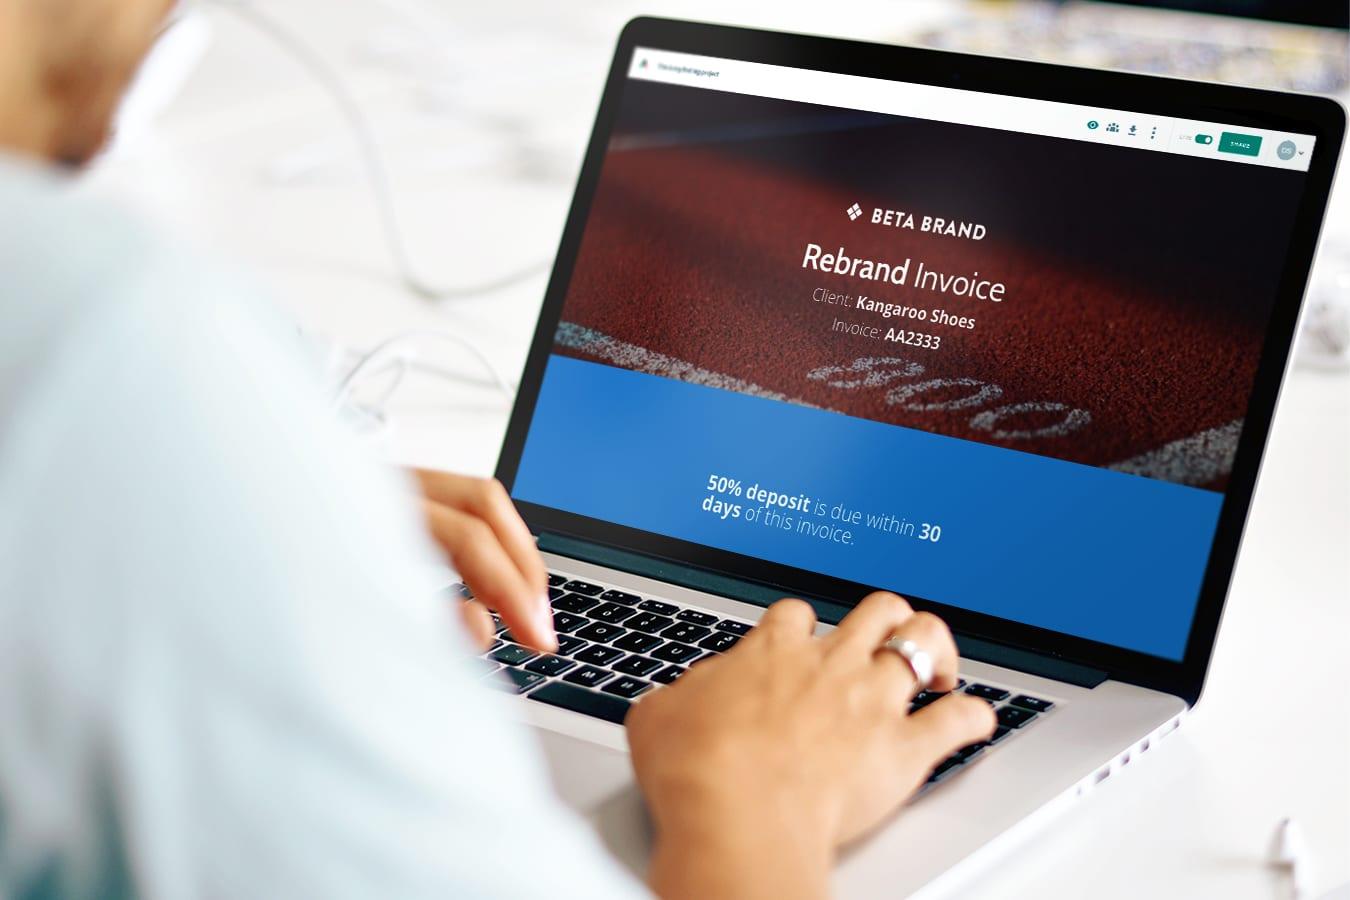 branding-invoice-template-desktop